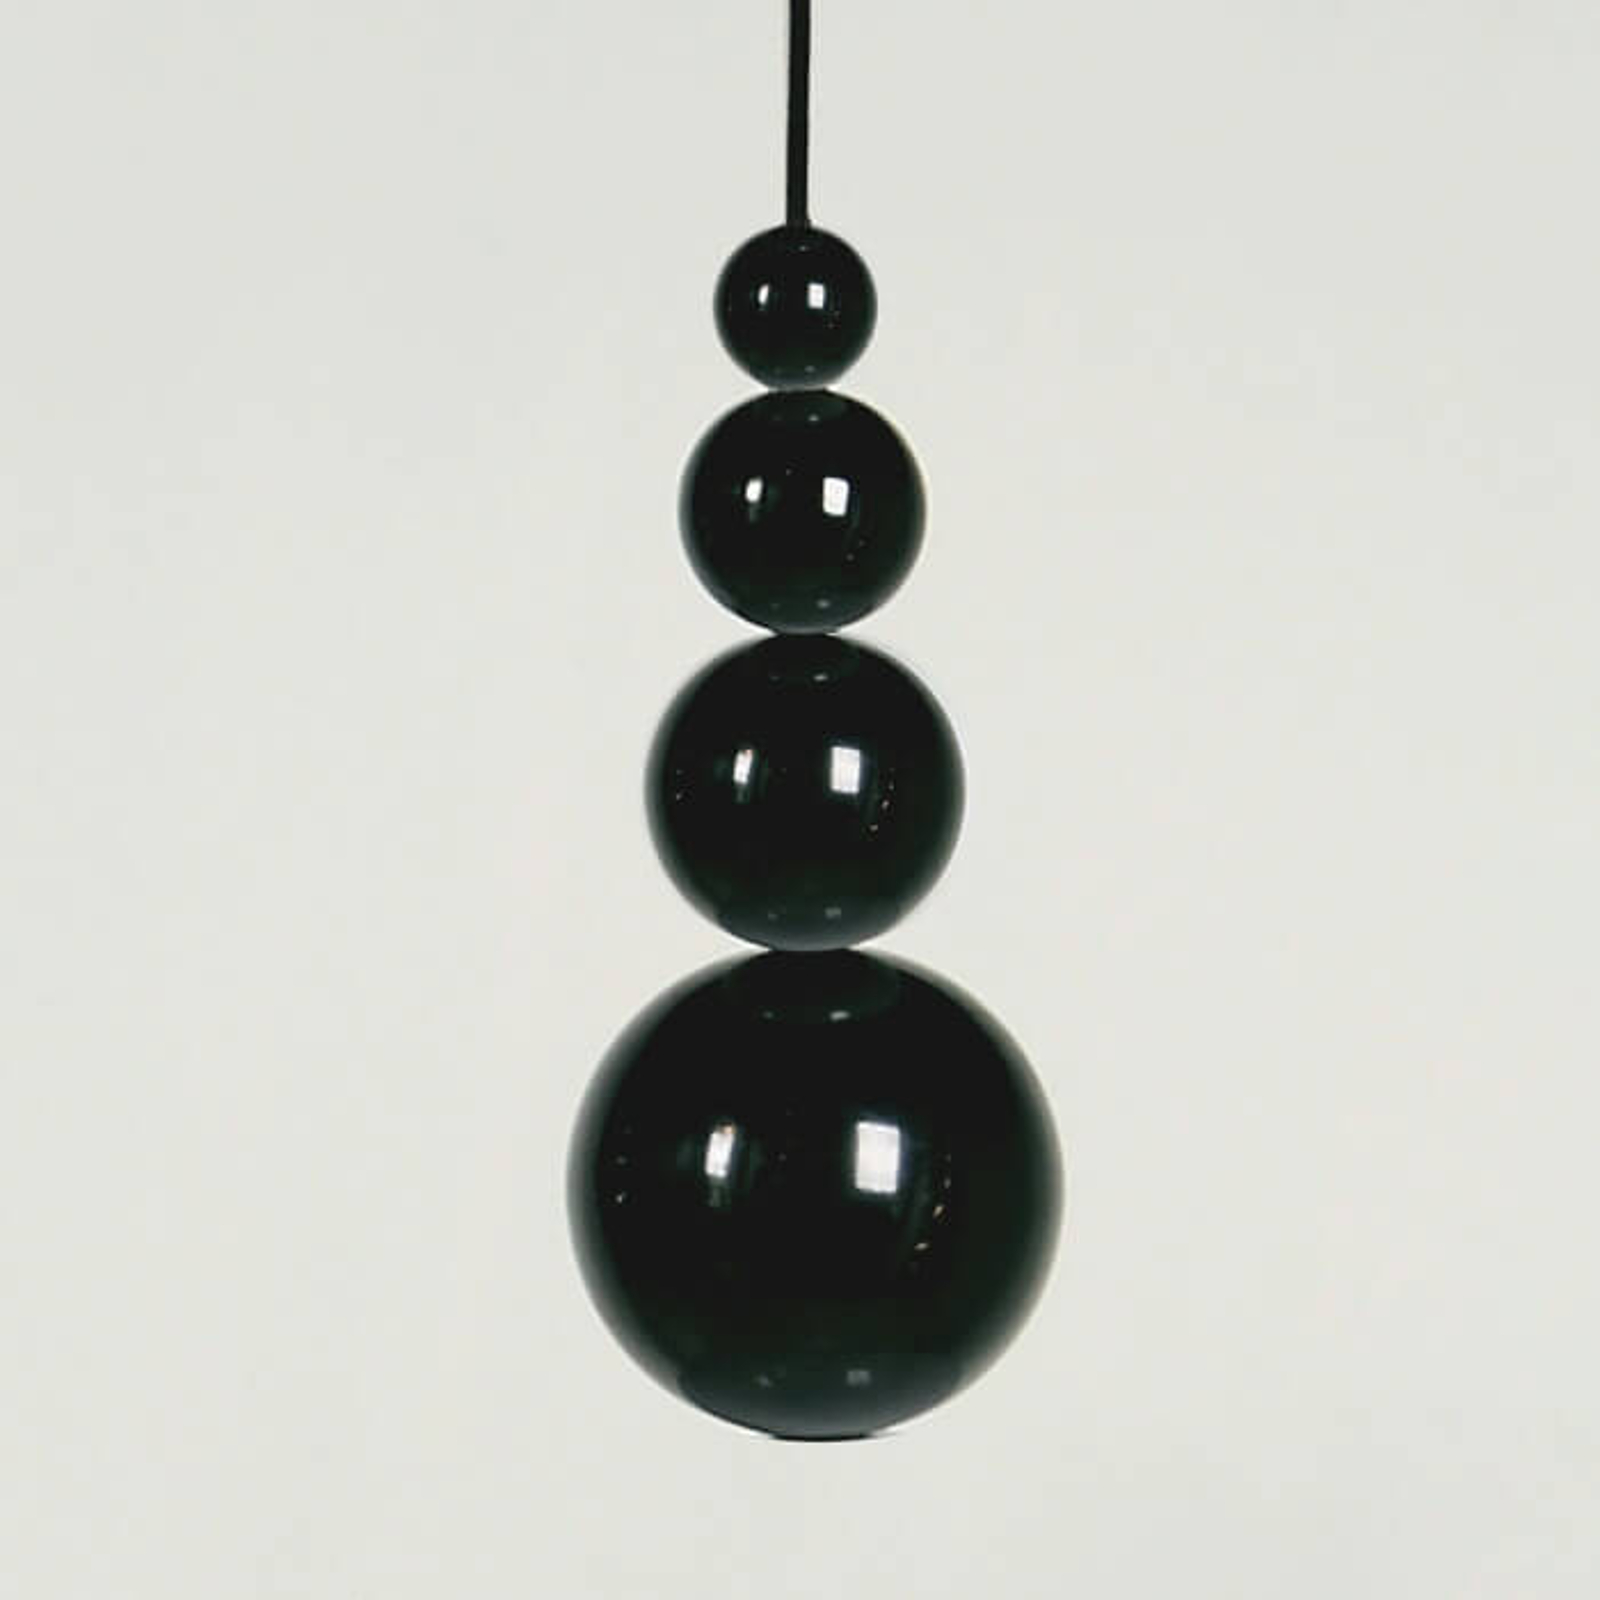 Innermost Bubble - hængelampe i sort